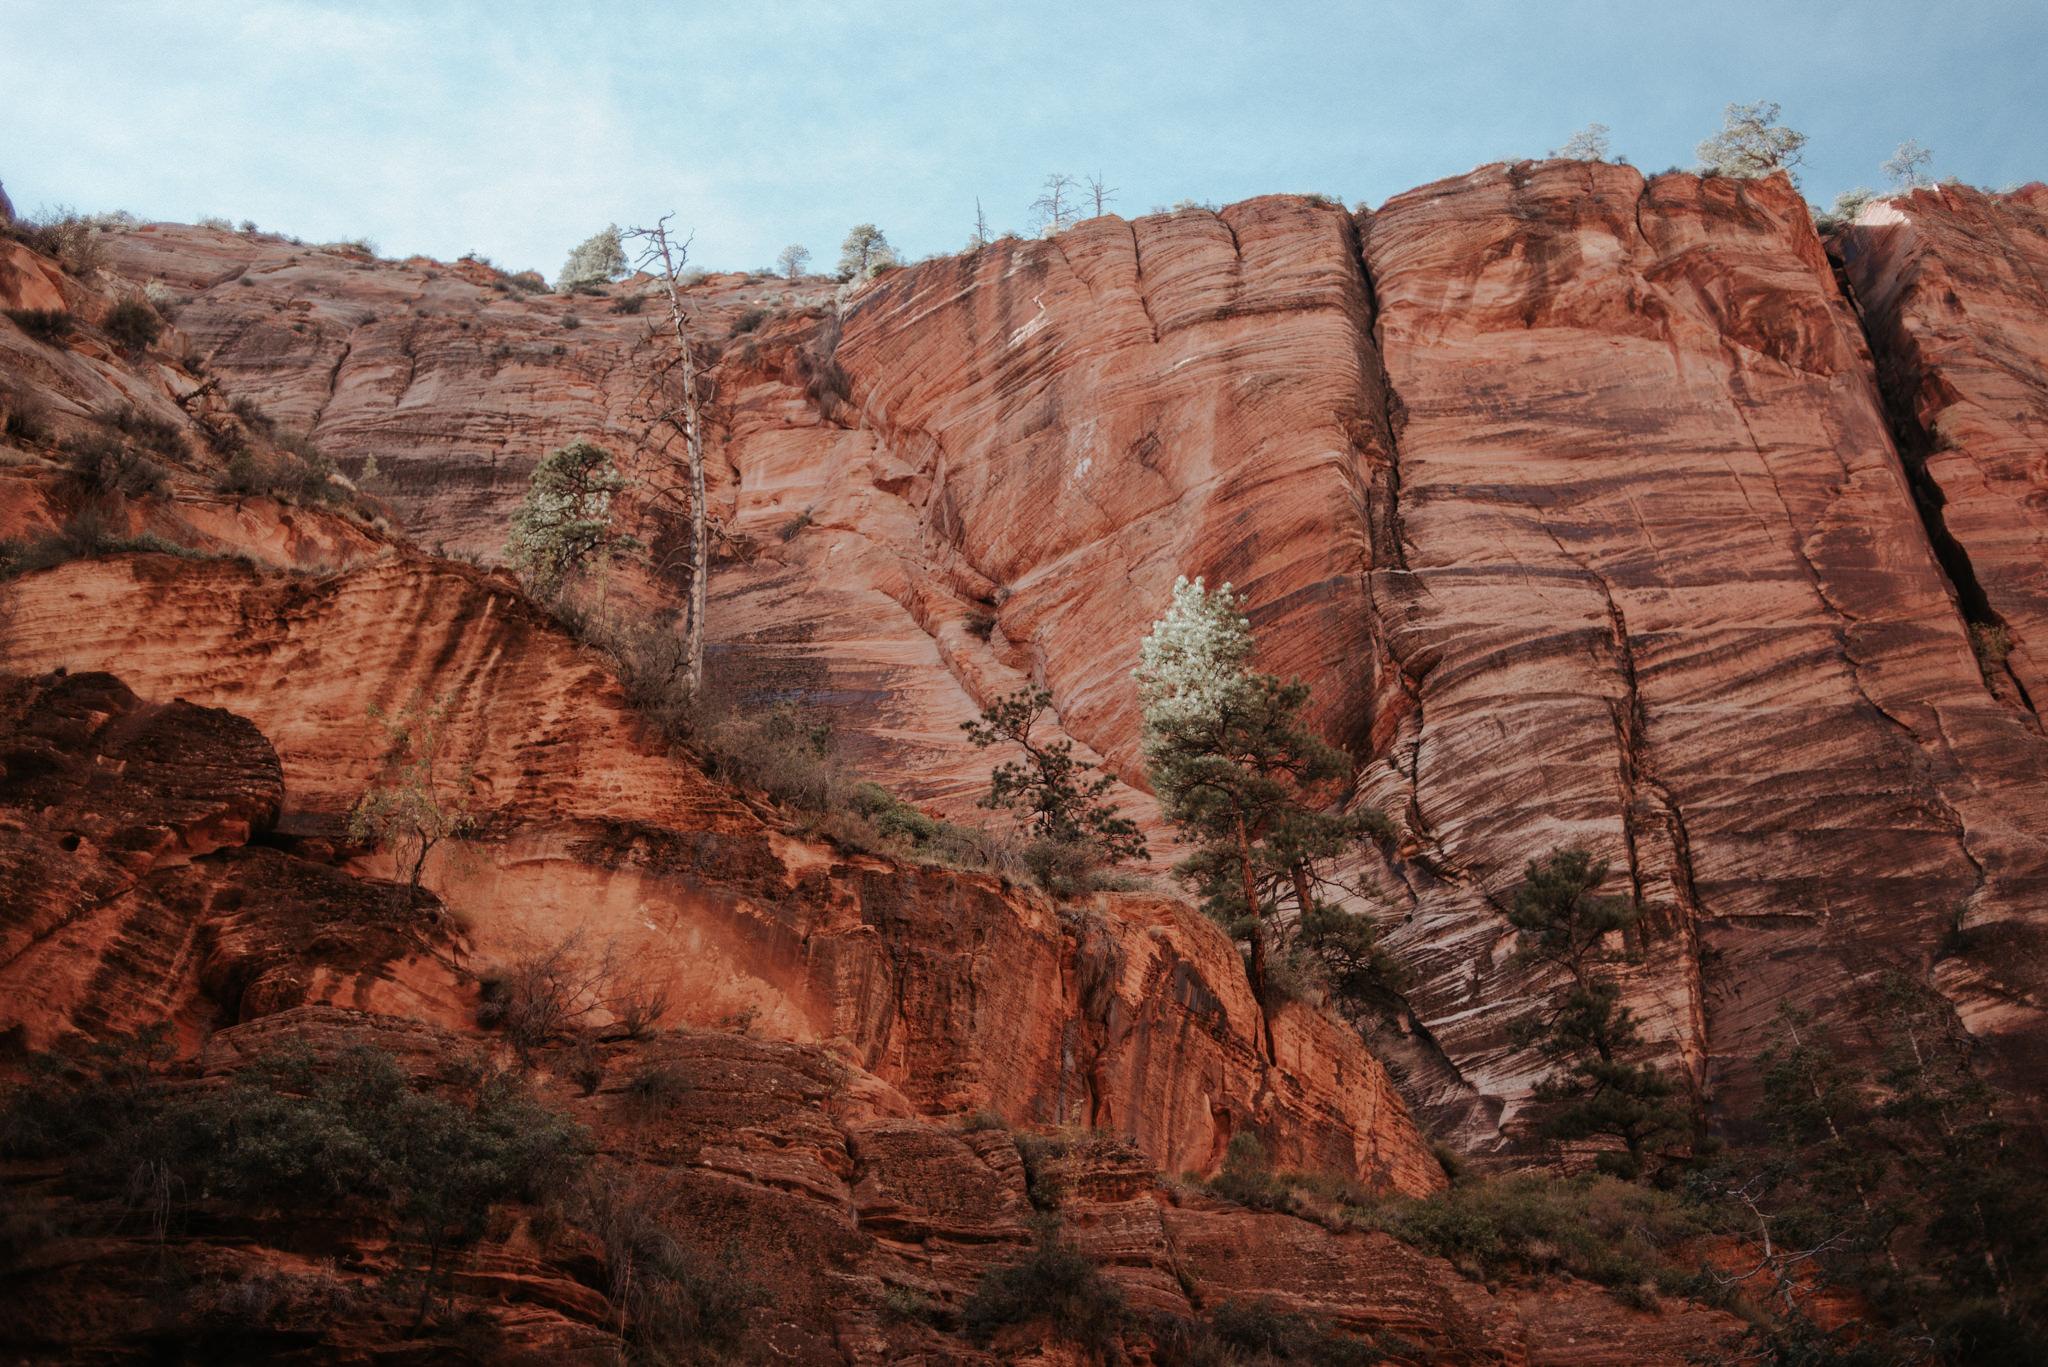 Hiking Angel's Landing, Zion National Park // Daring Wanderer: www.daringwanderer.com